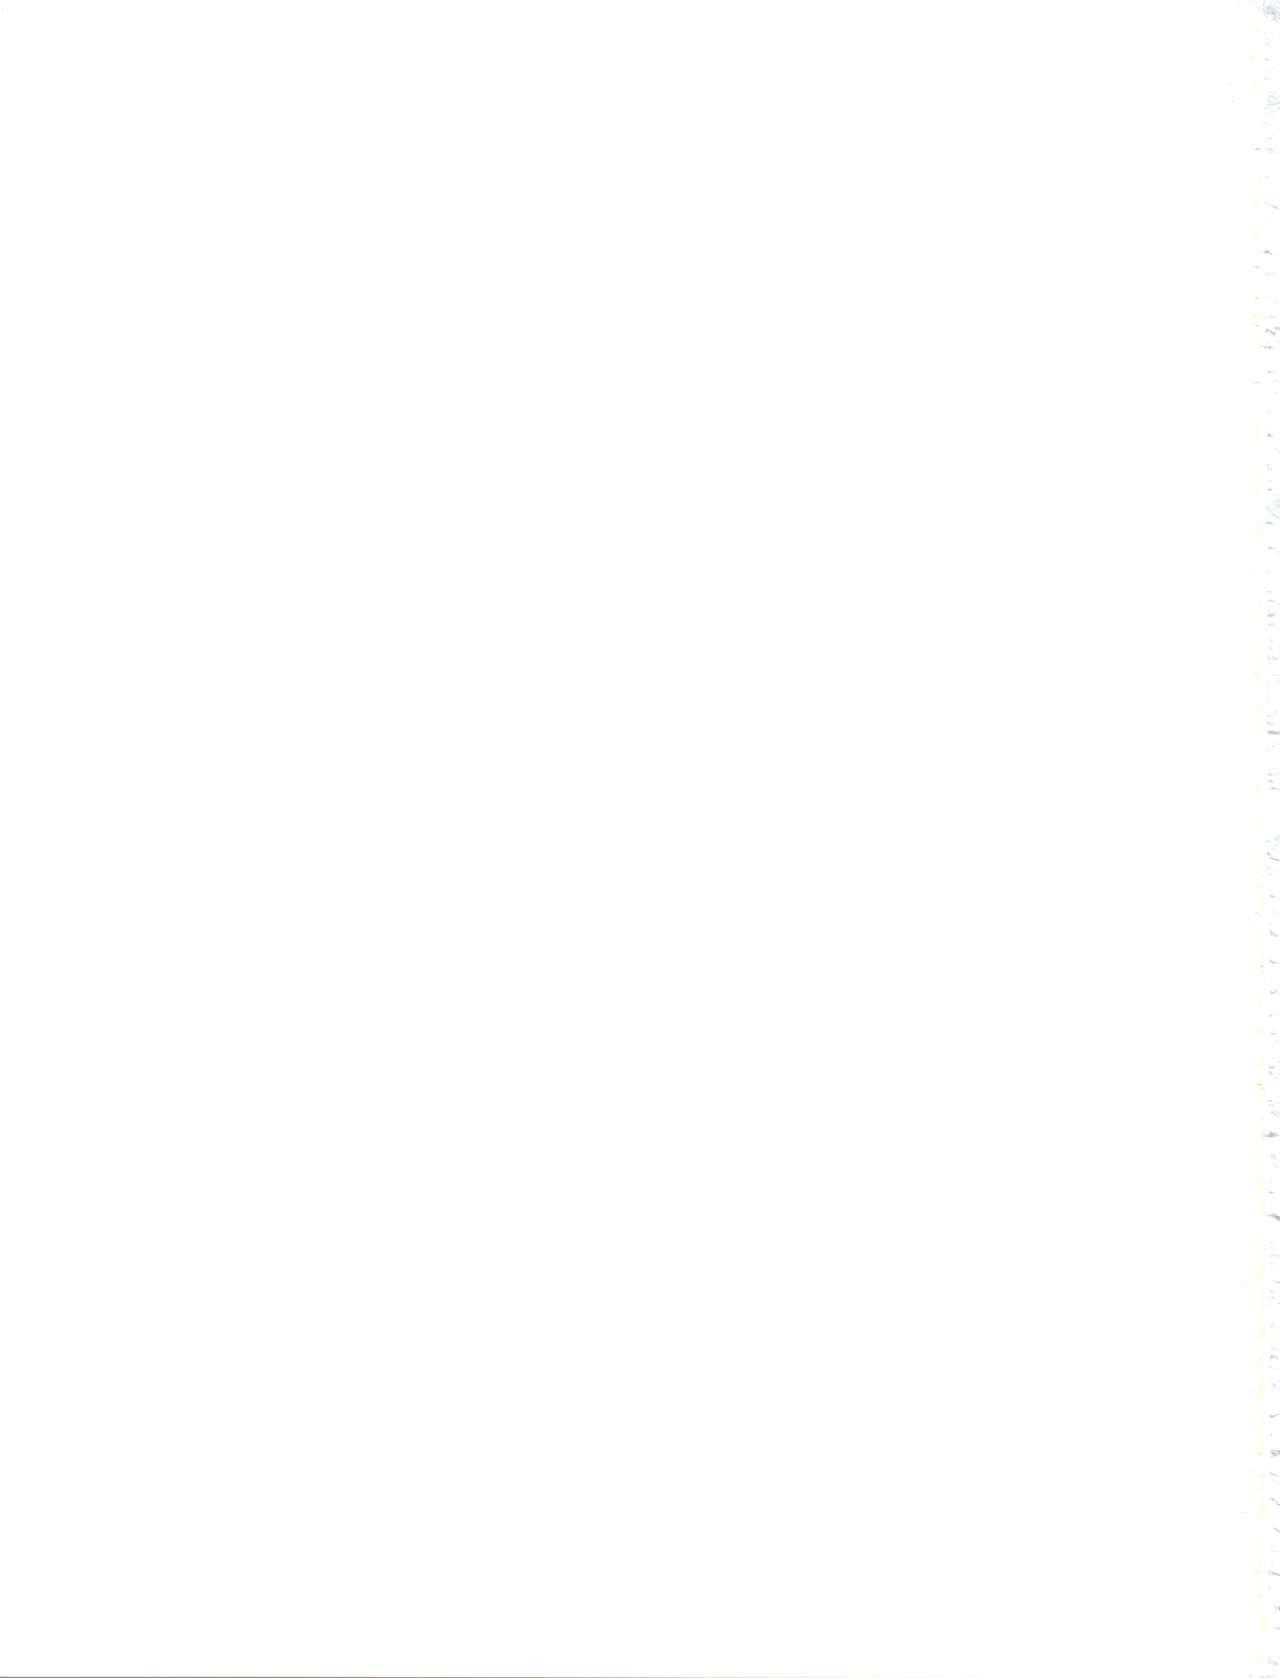 (C93) [Old School Academy (Amedama Akihito)] Fushigi-san no HENTAI ☆ MAHOH Futanari-hen (Creamy Mami, Magical Emi, Pastel Yumi, Magical Fairy Persia, Fancy Lala) 34